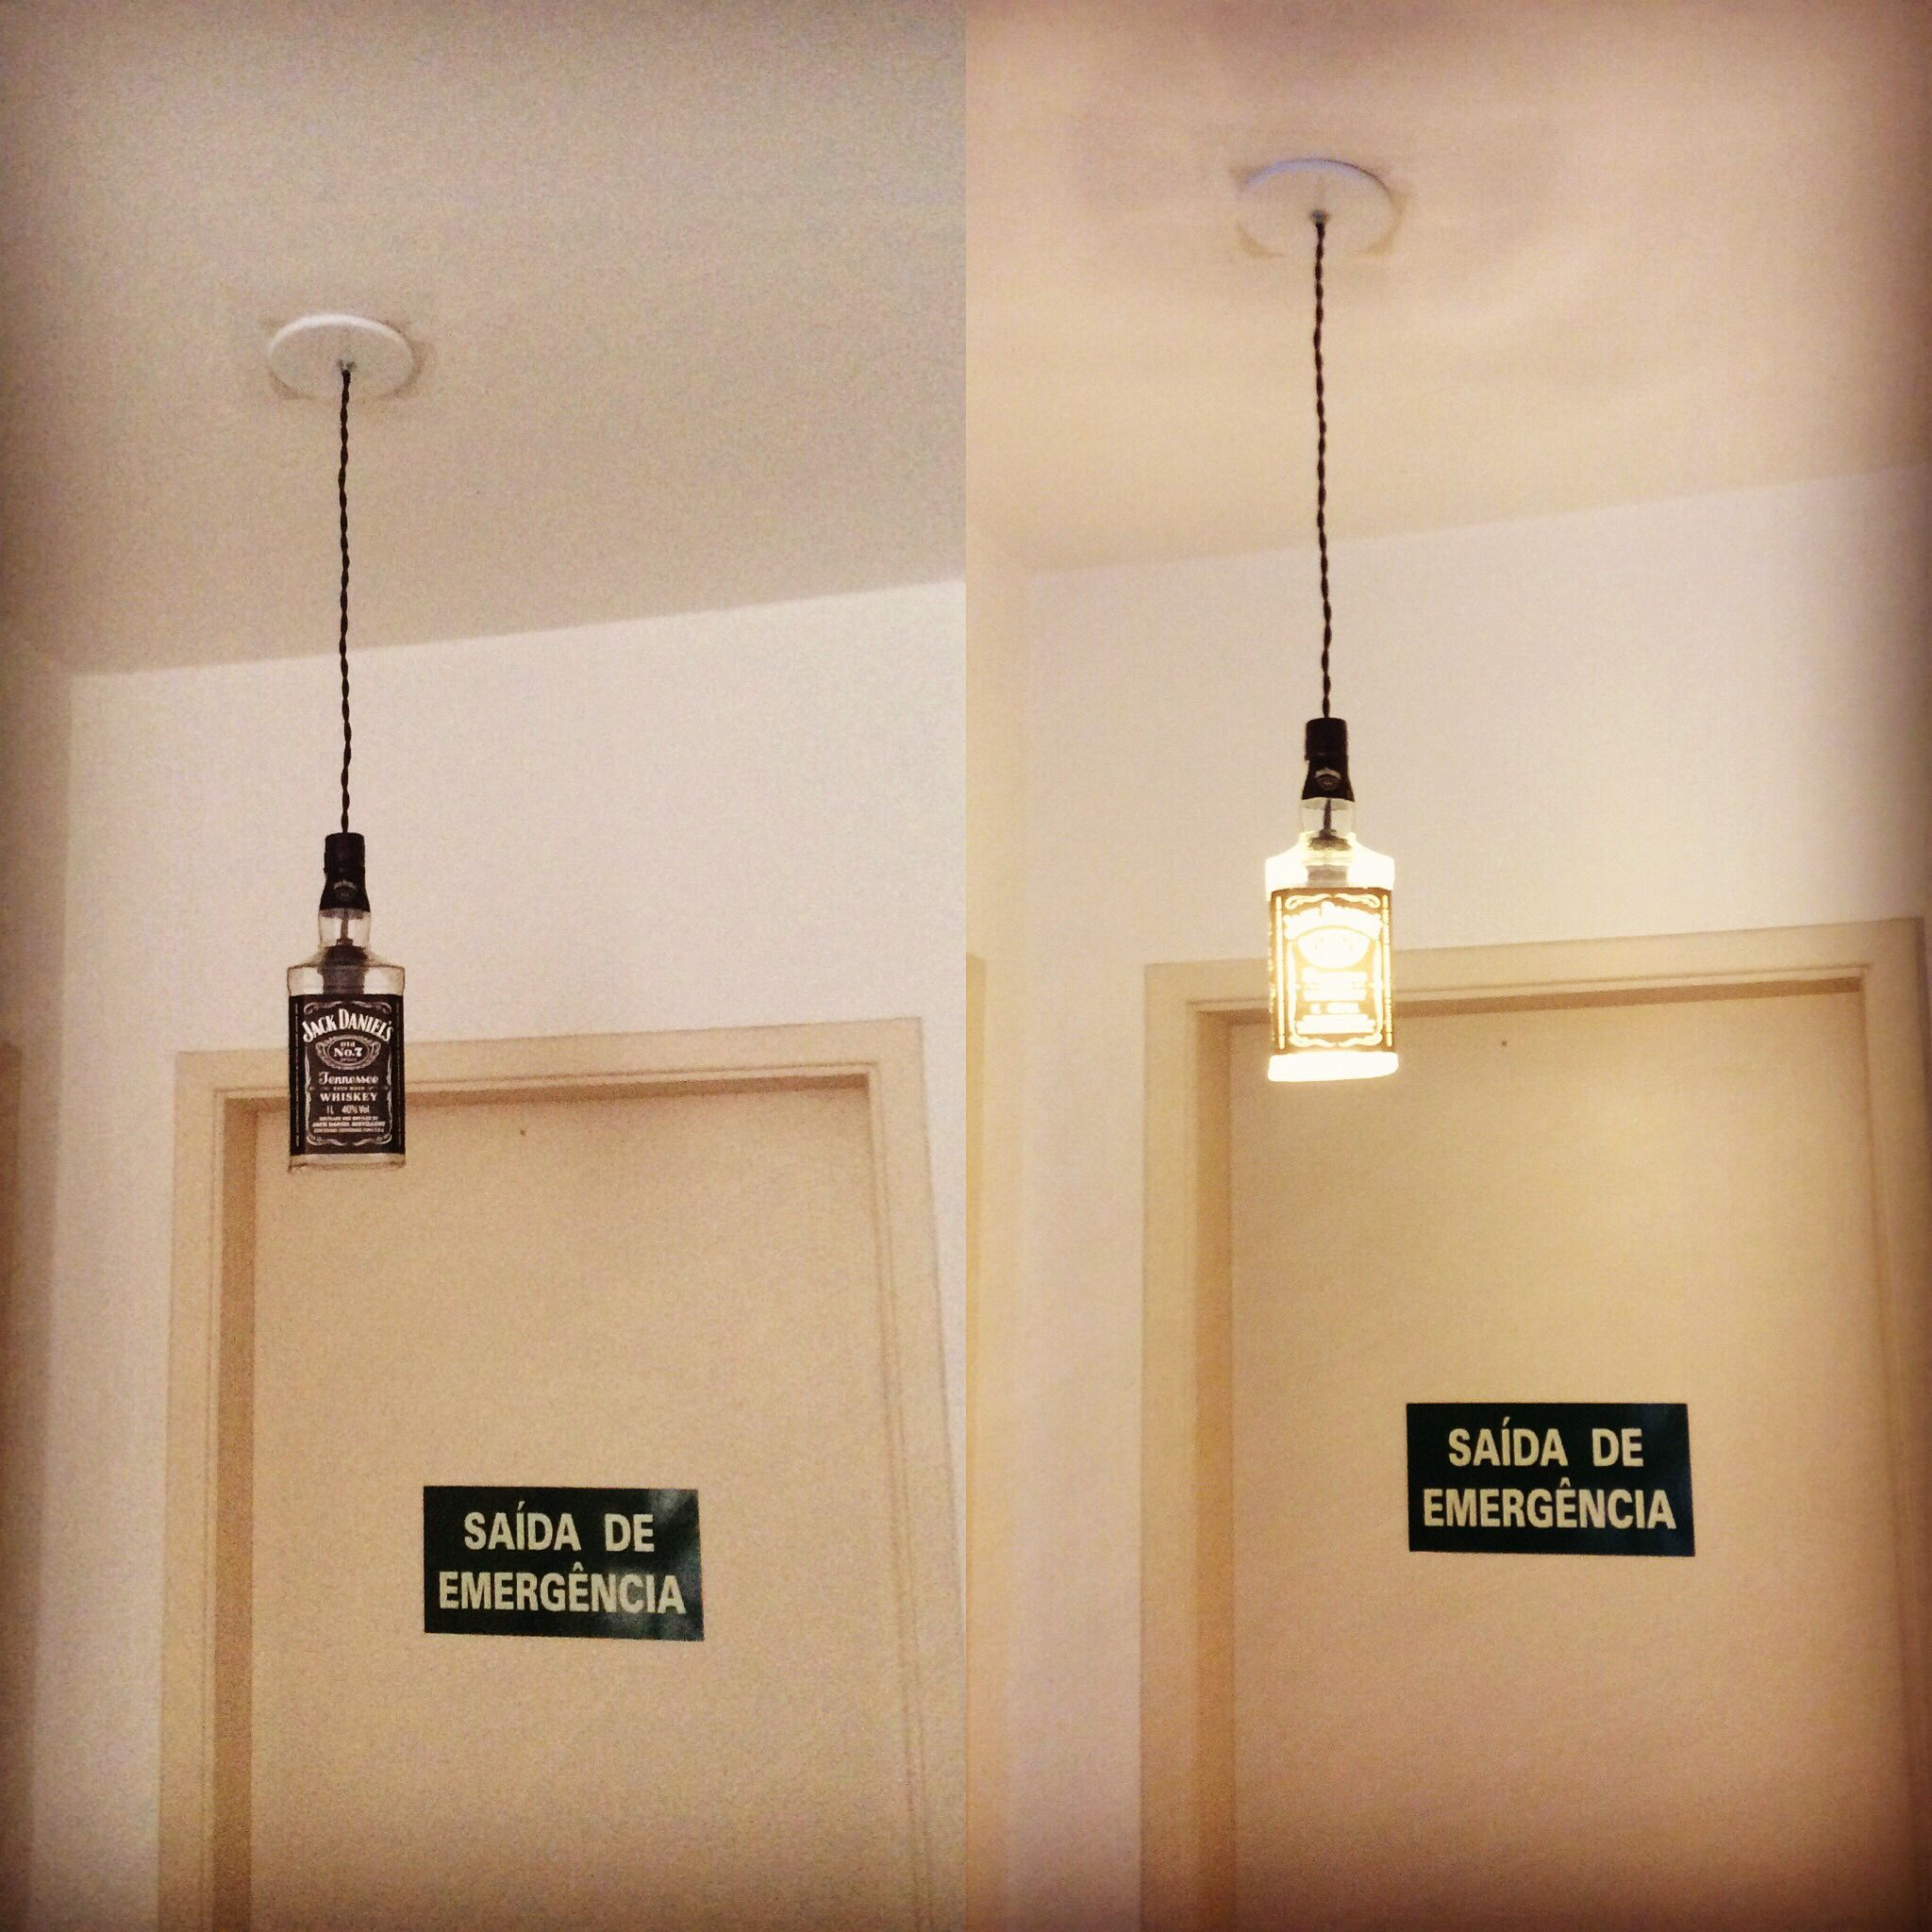 #apartamentosemgrana